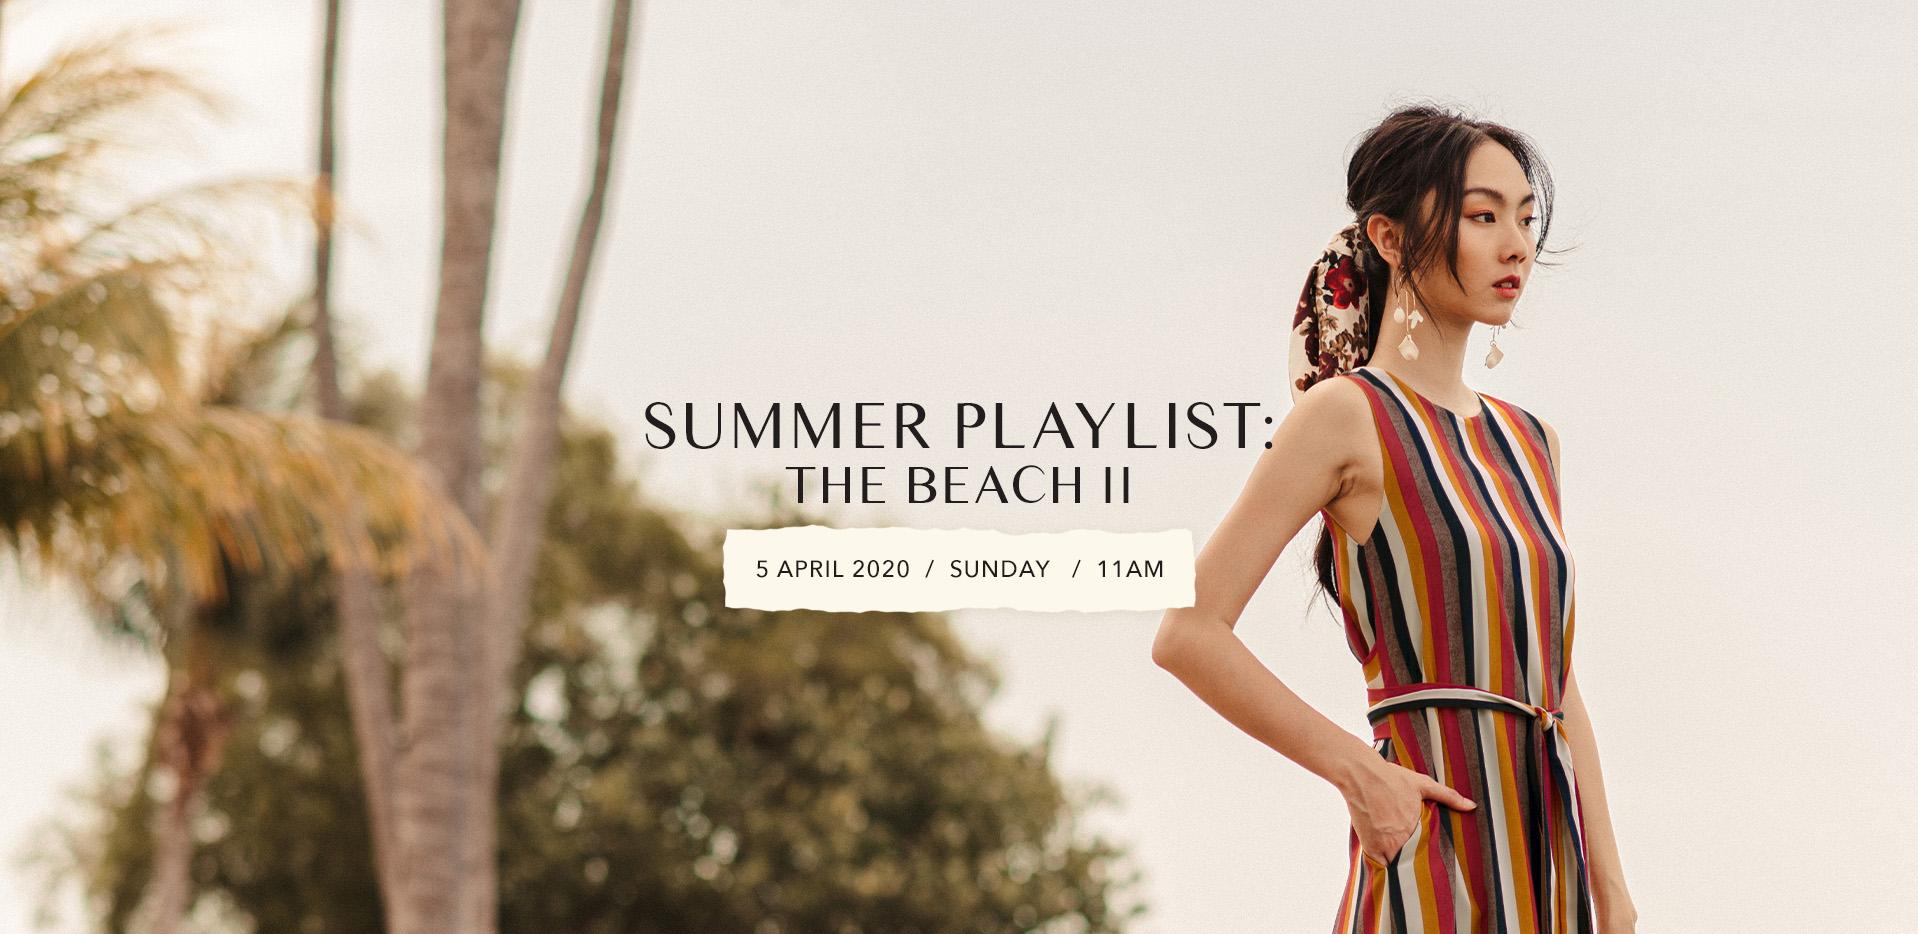 SUMMER PLAYLIST: THE BEACH II